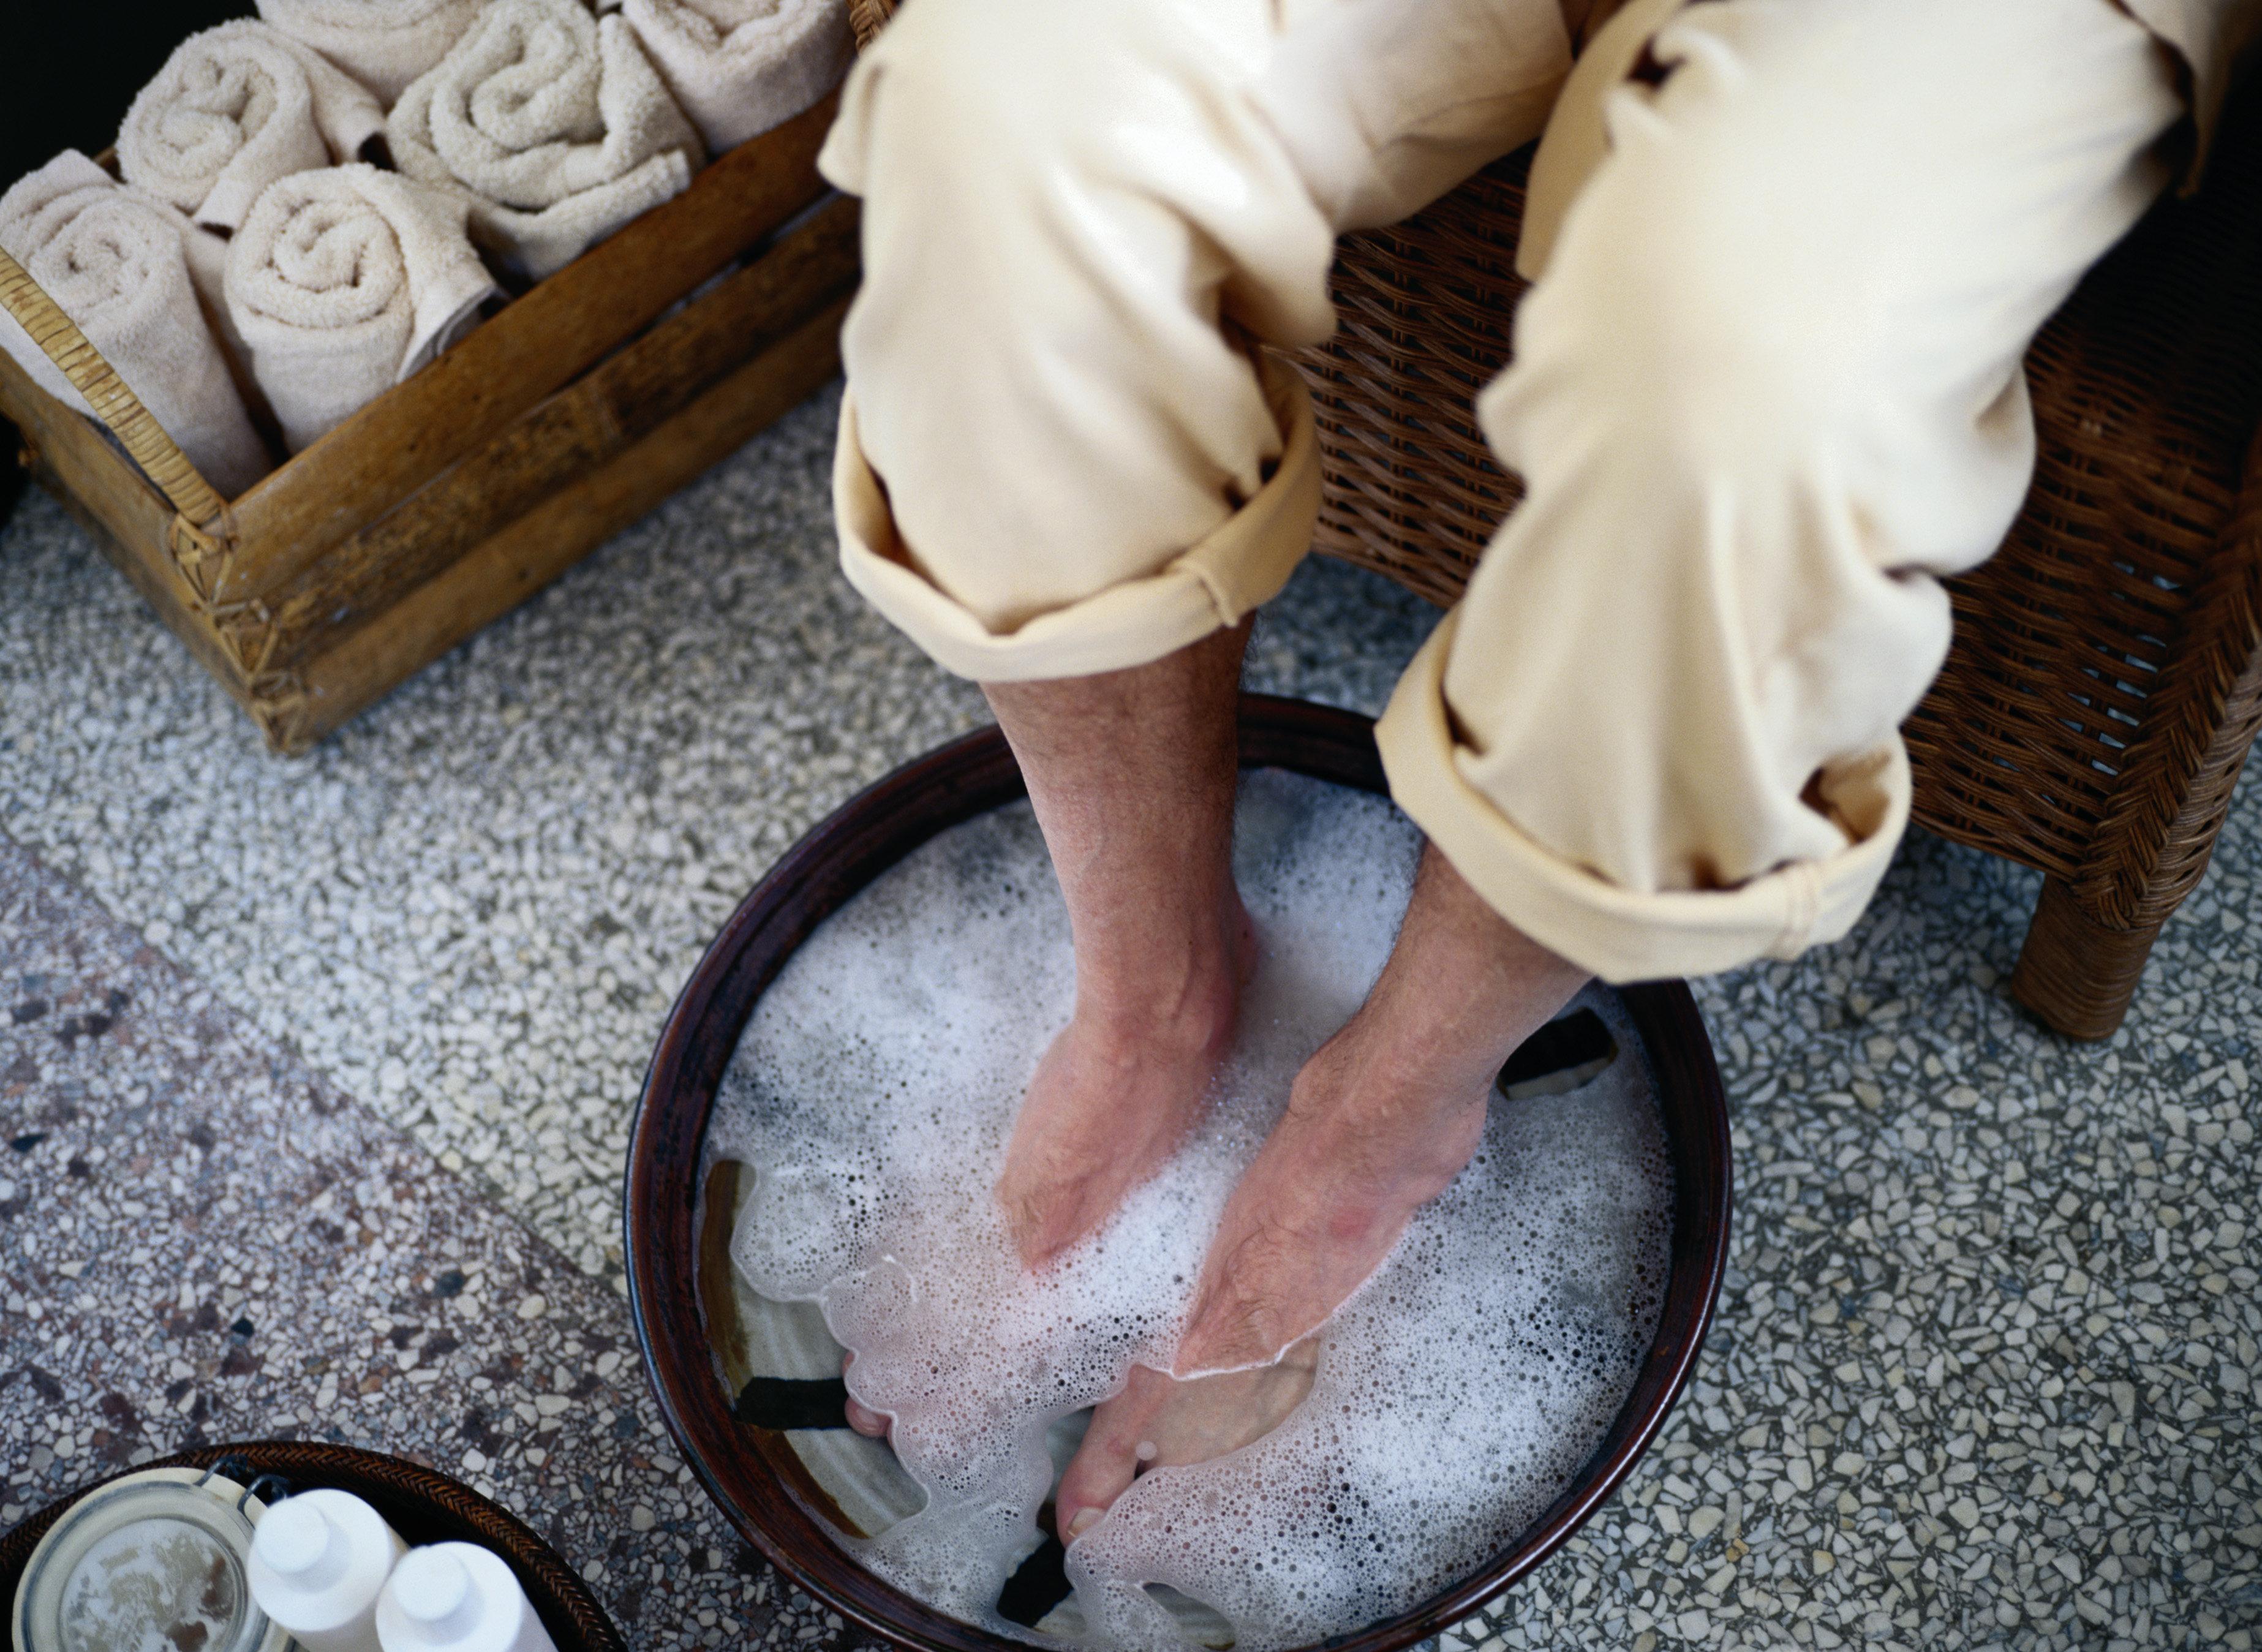 Man Soaking His Feet